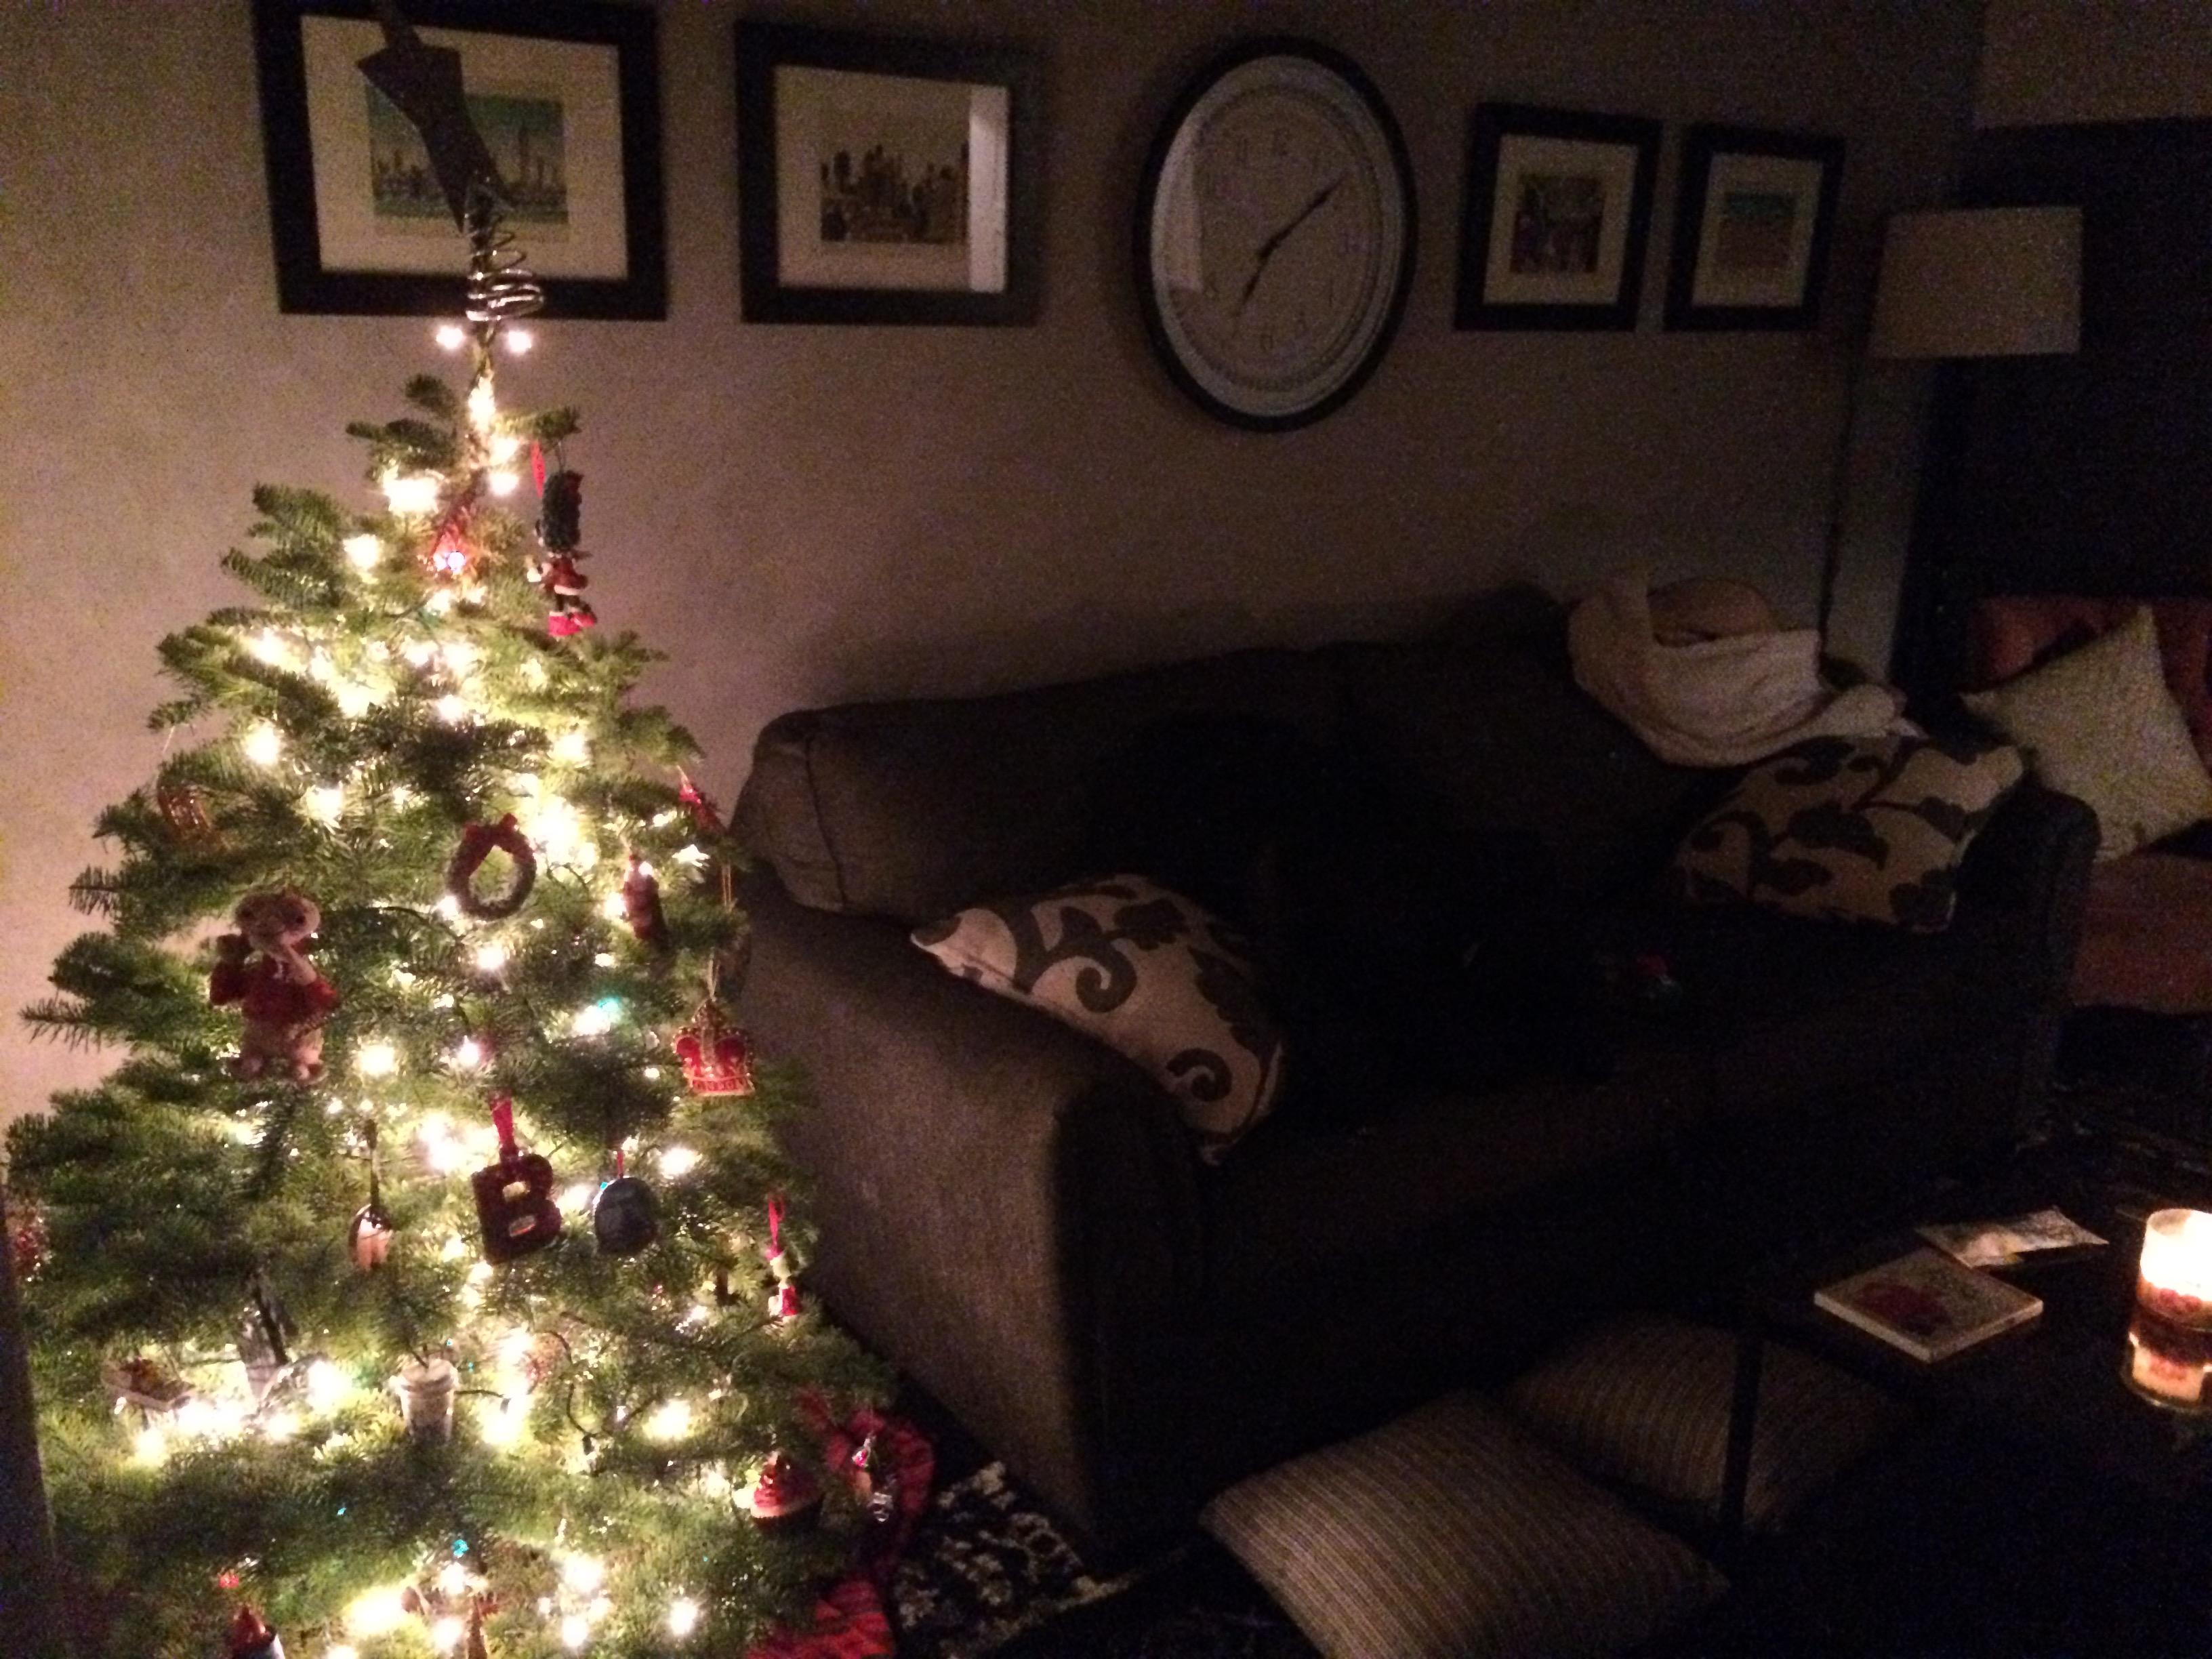 Oh Christmas Tree, Oh Christmas Tree Dec. 6, 2015 924